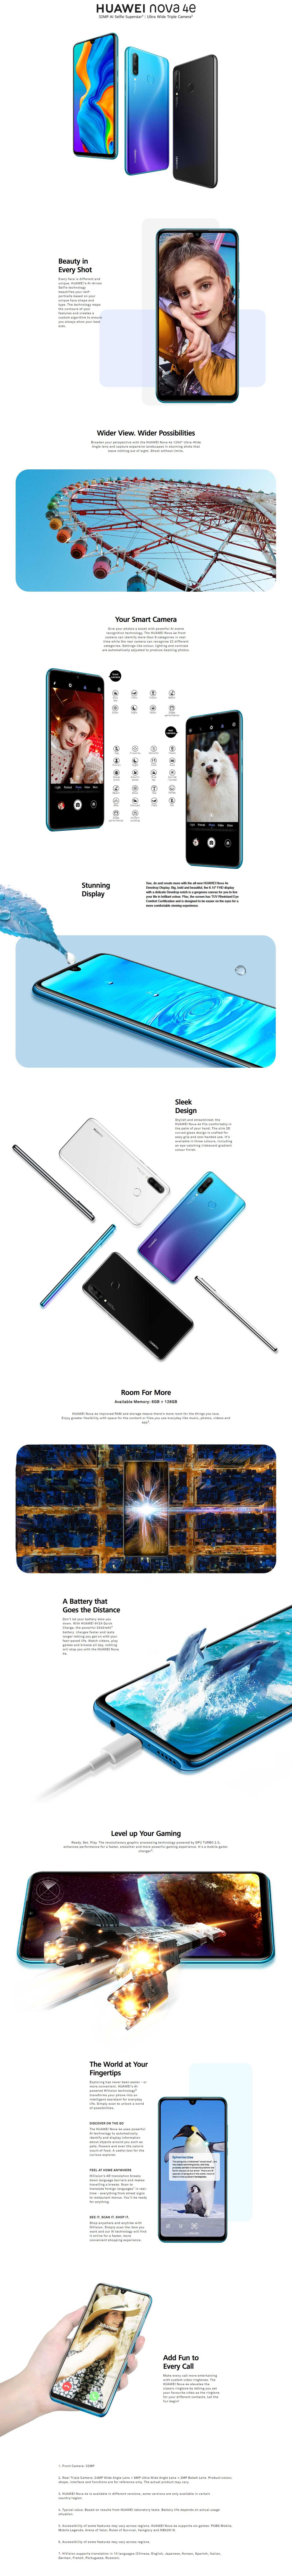 Huawei Nova 4E 6GB+128GB White + FREE Premium Gift Box